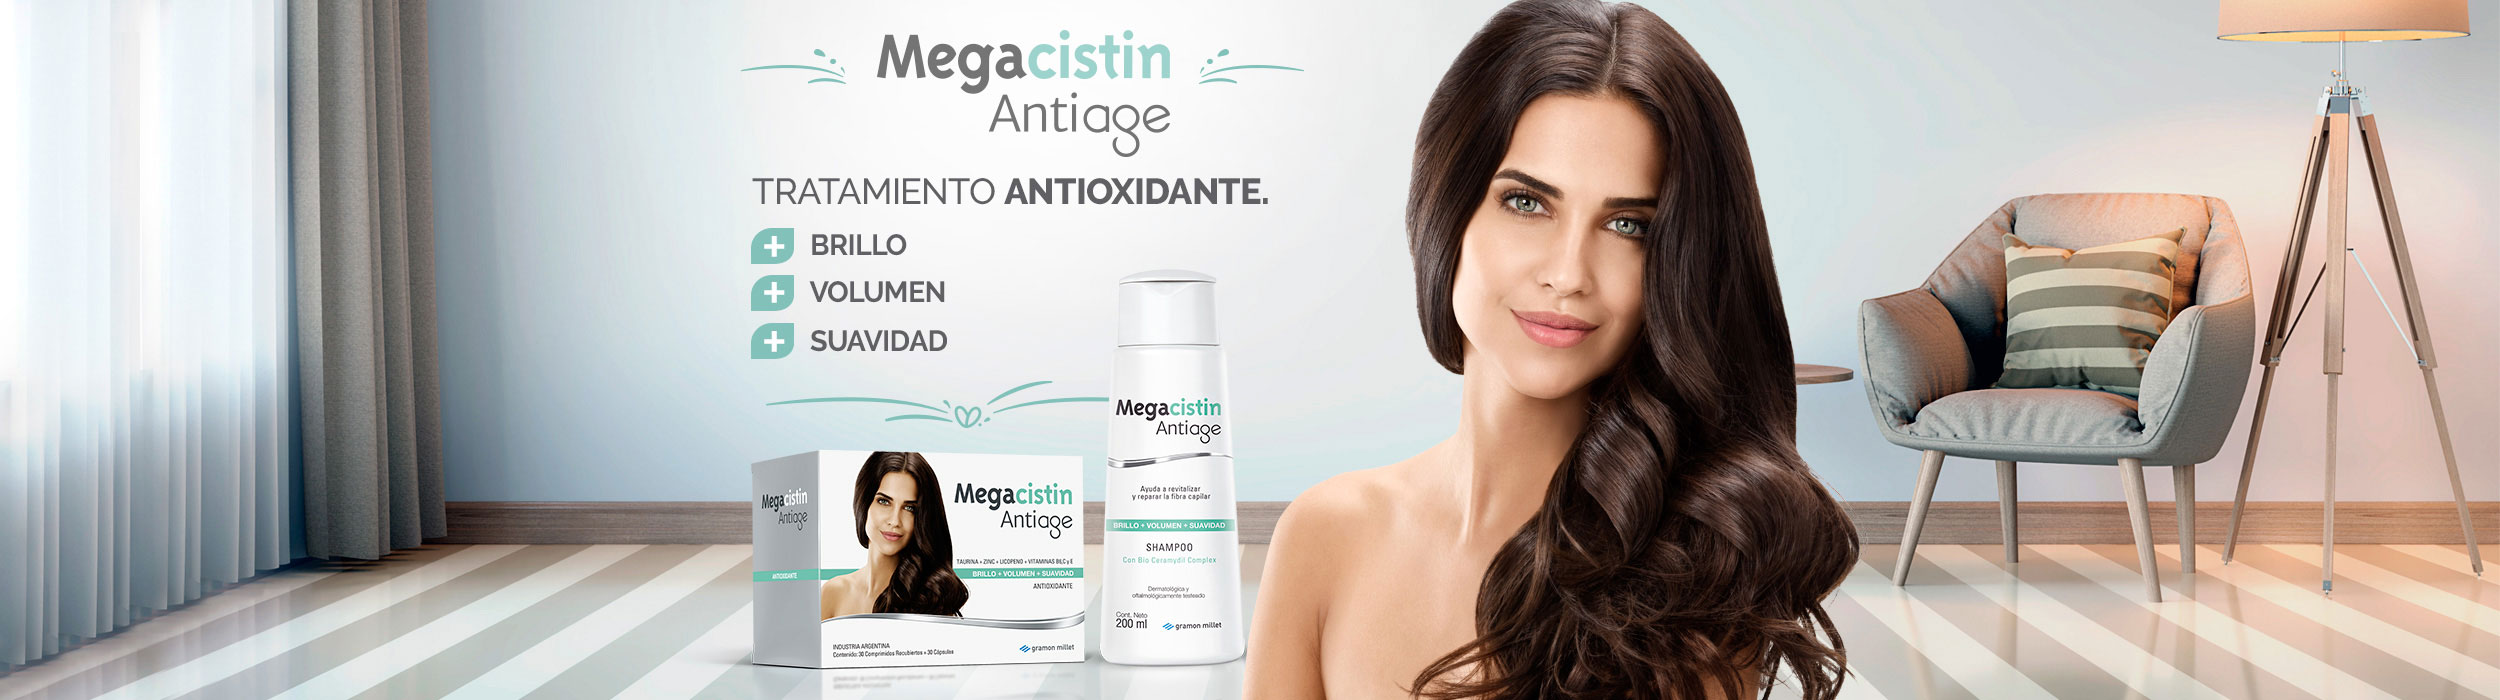 Megacistin Antiage